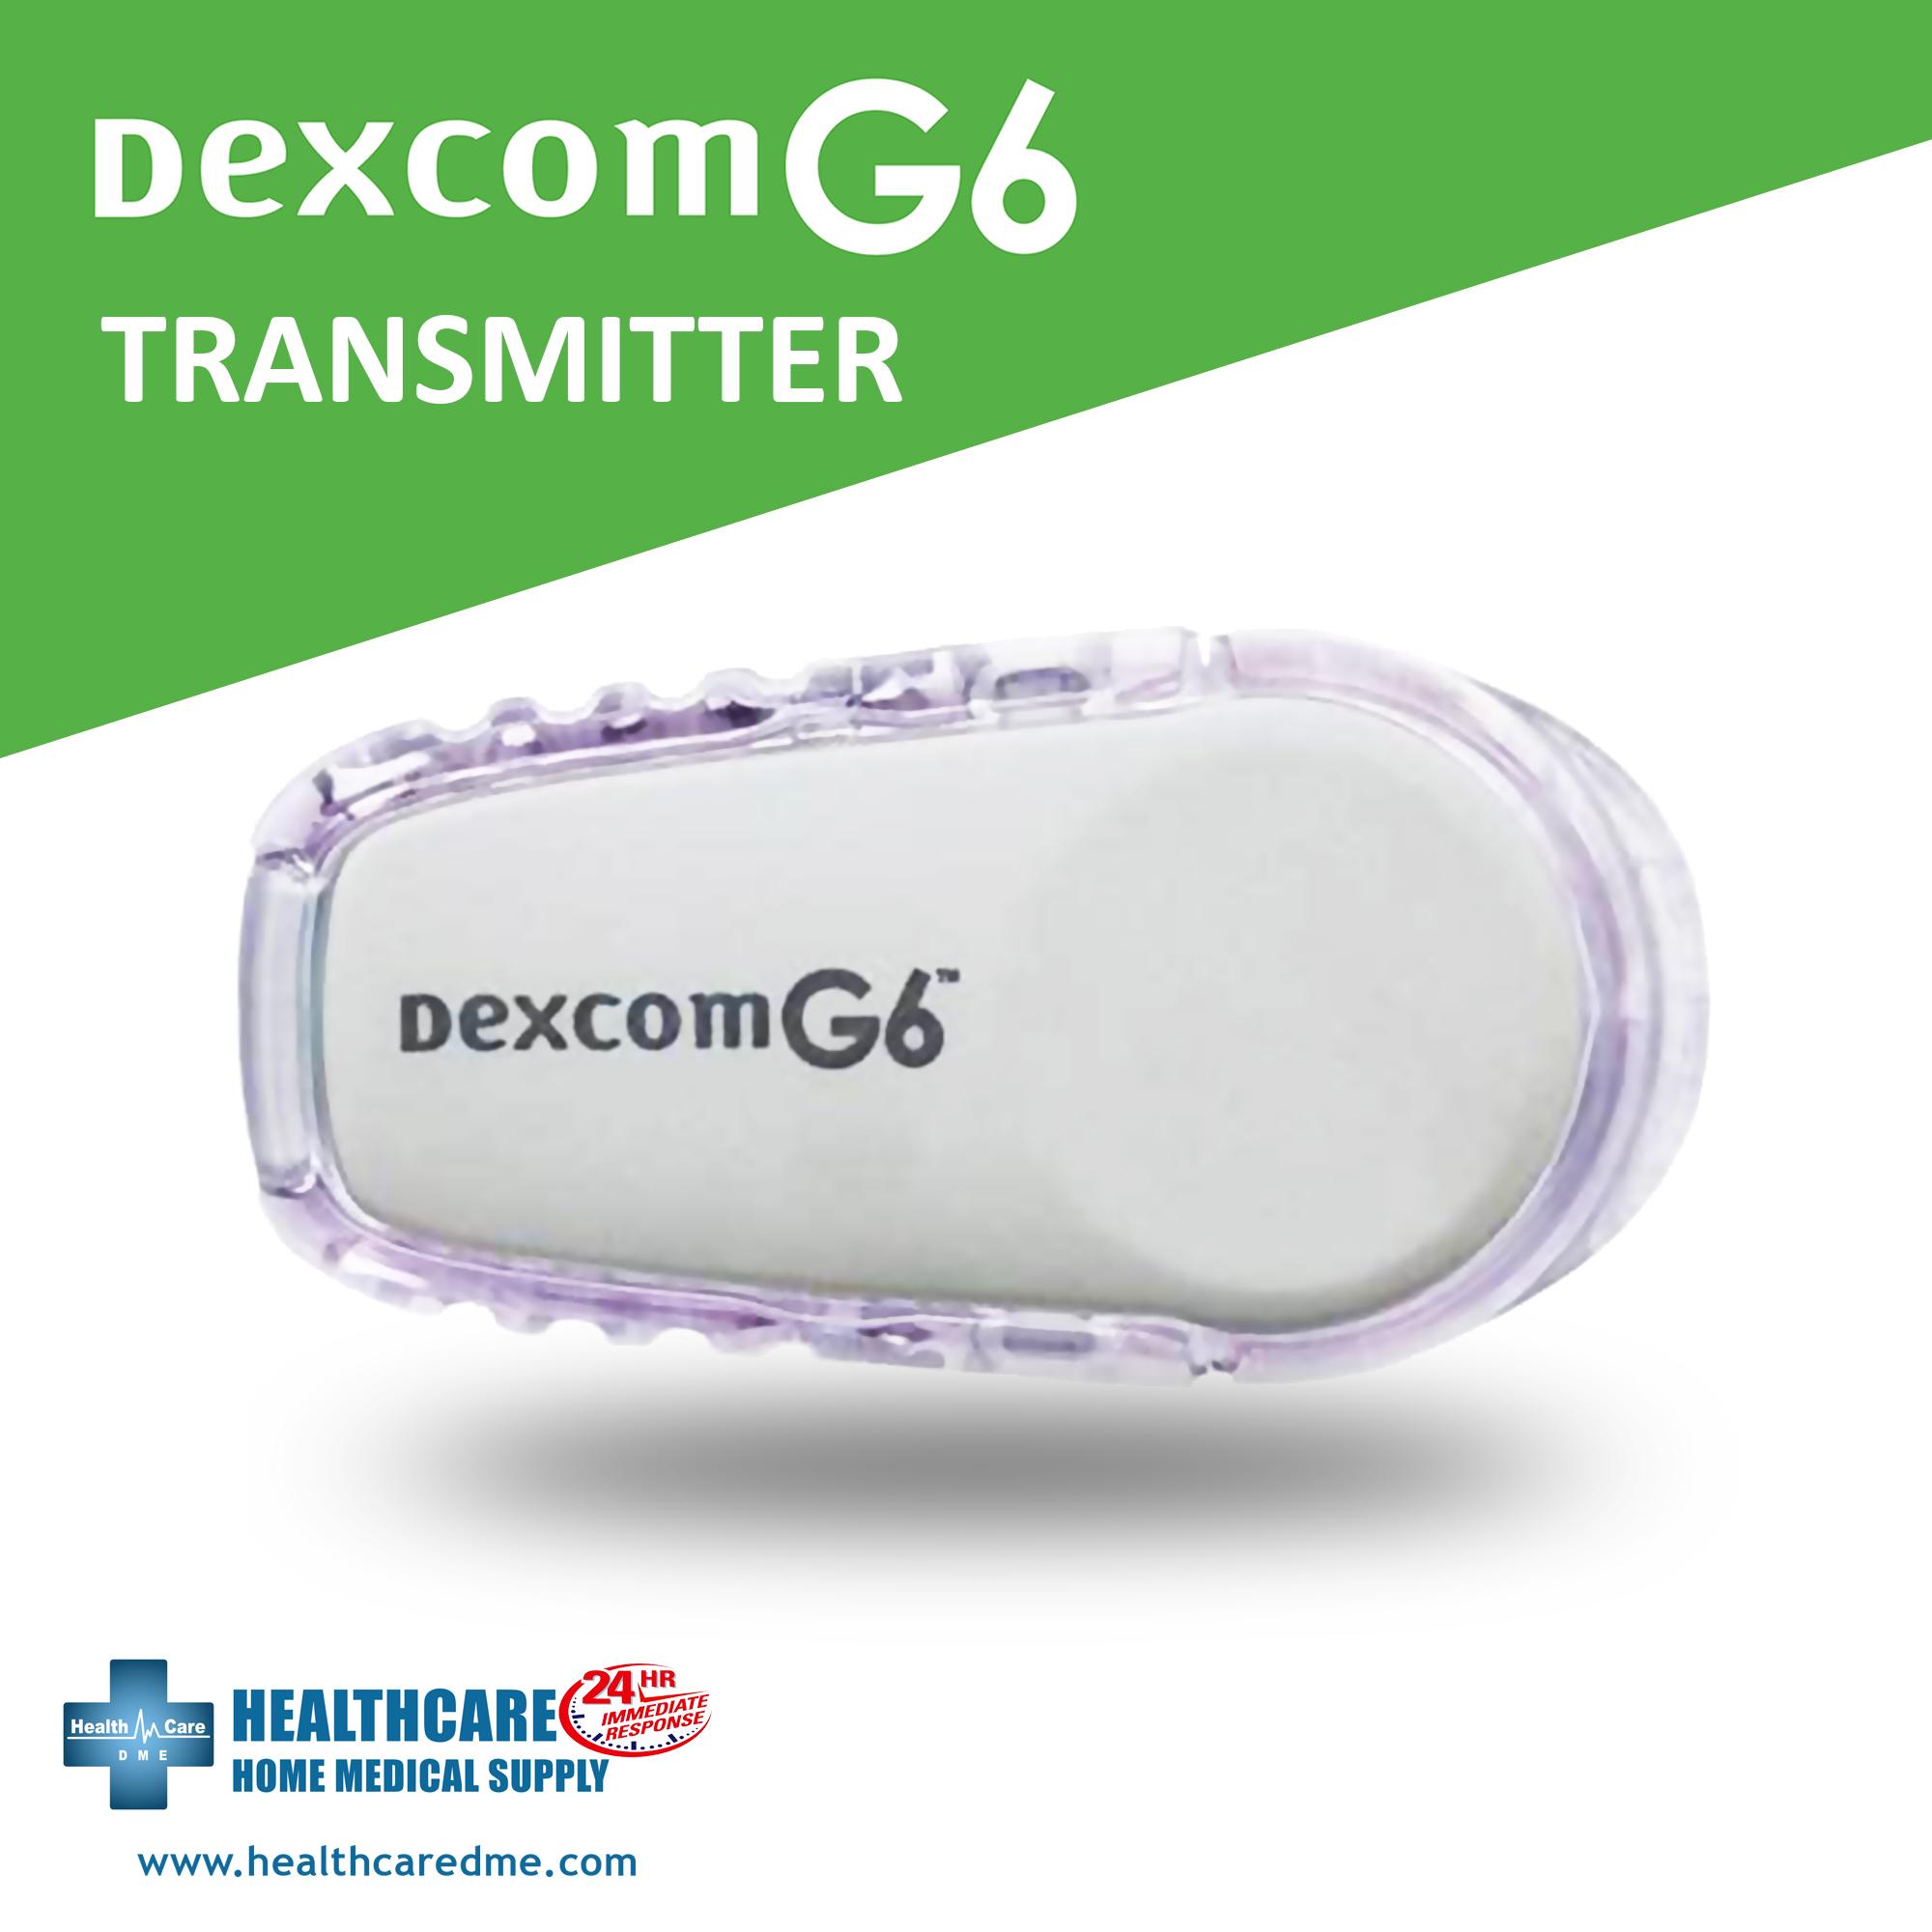 DEXCOM G6 TRANSMITTER   Michigan USA Diabetes Continuous Glucose Monitoring System DEXCOM G6 TRANSMITTER